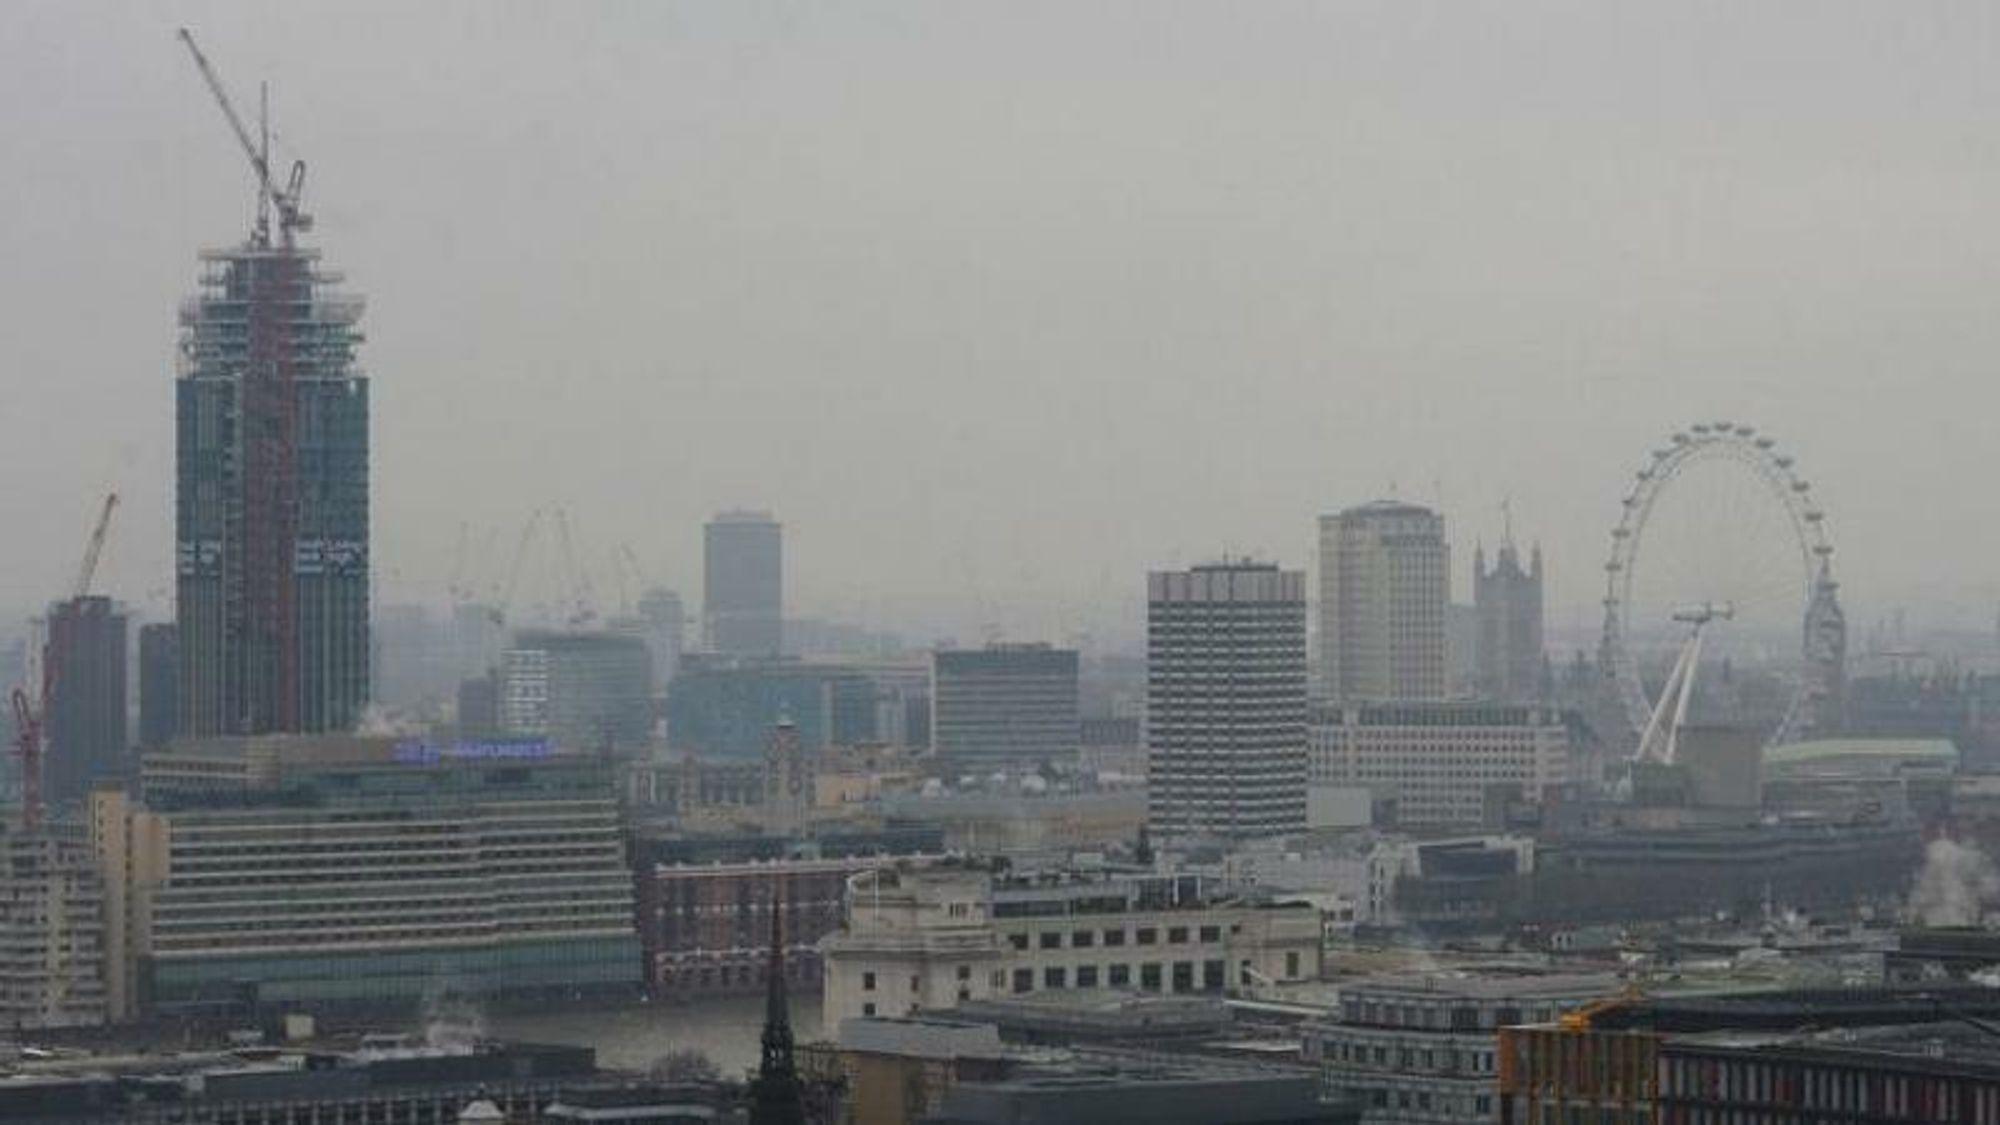 Etter 20 års forbud: Blyforurensning fra bensin kan stadig spores i London